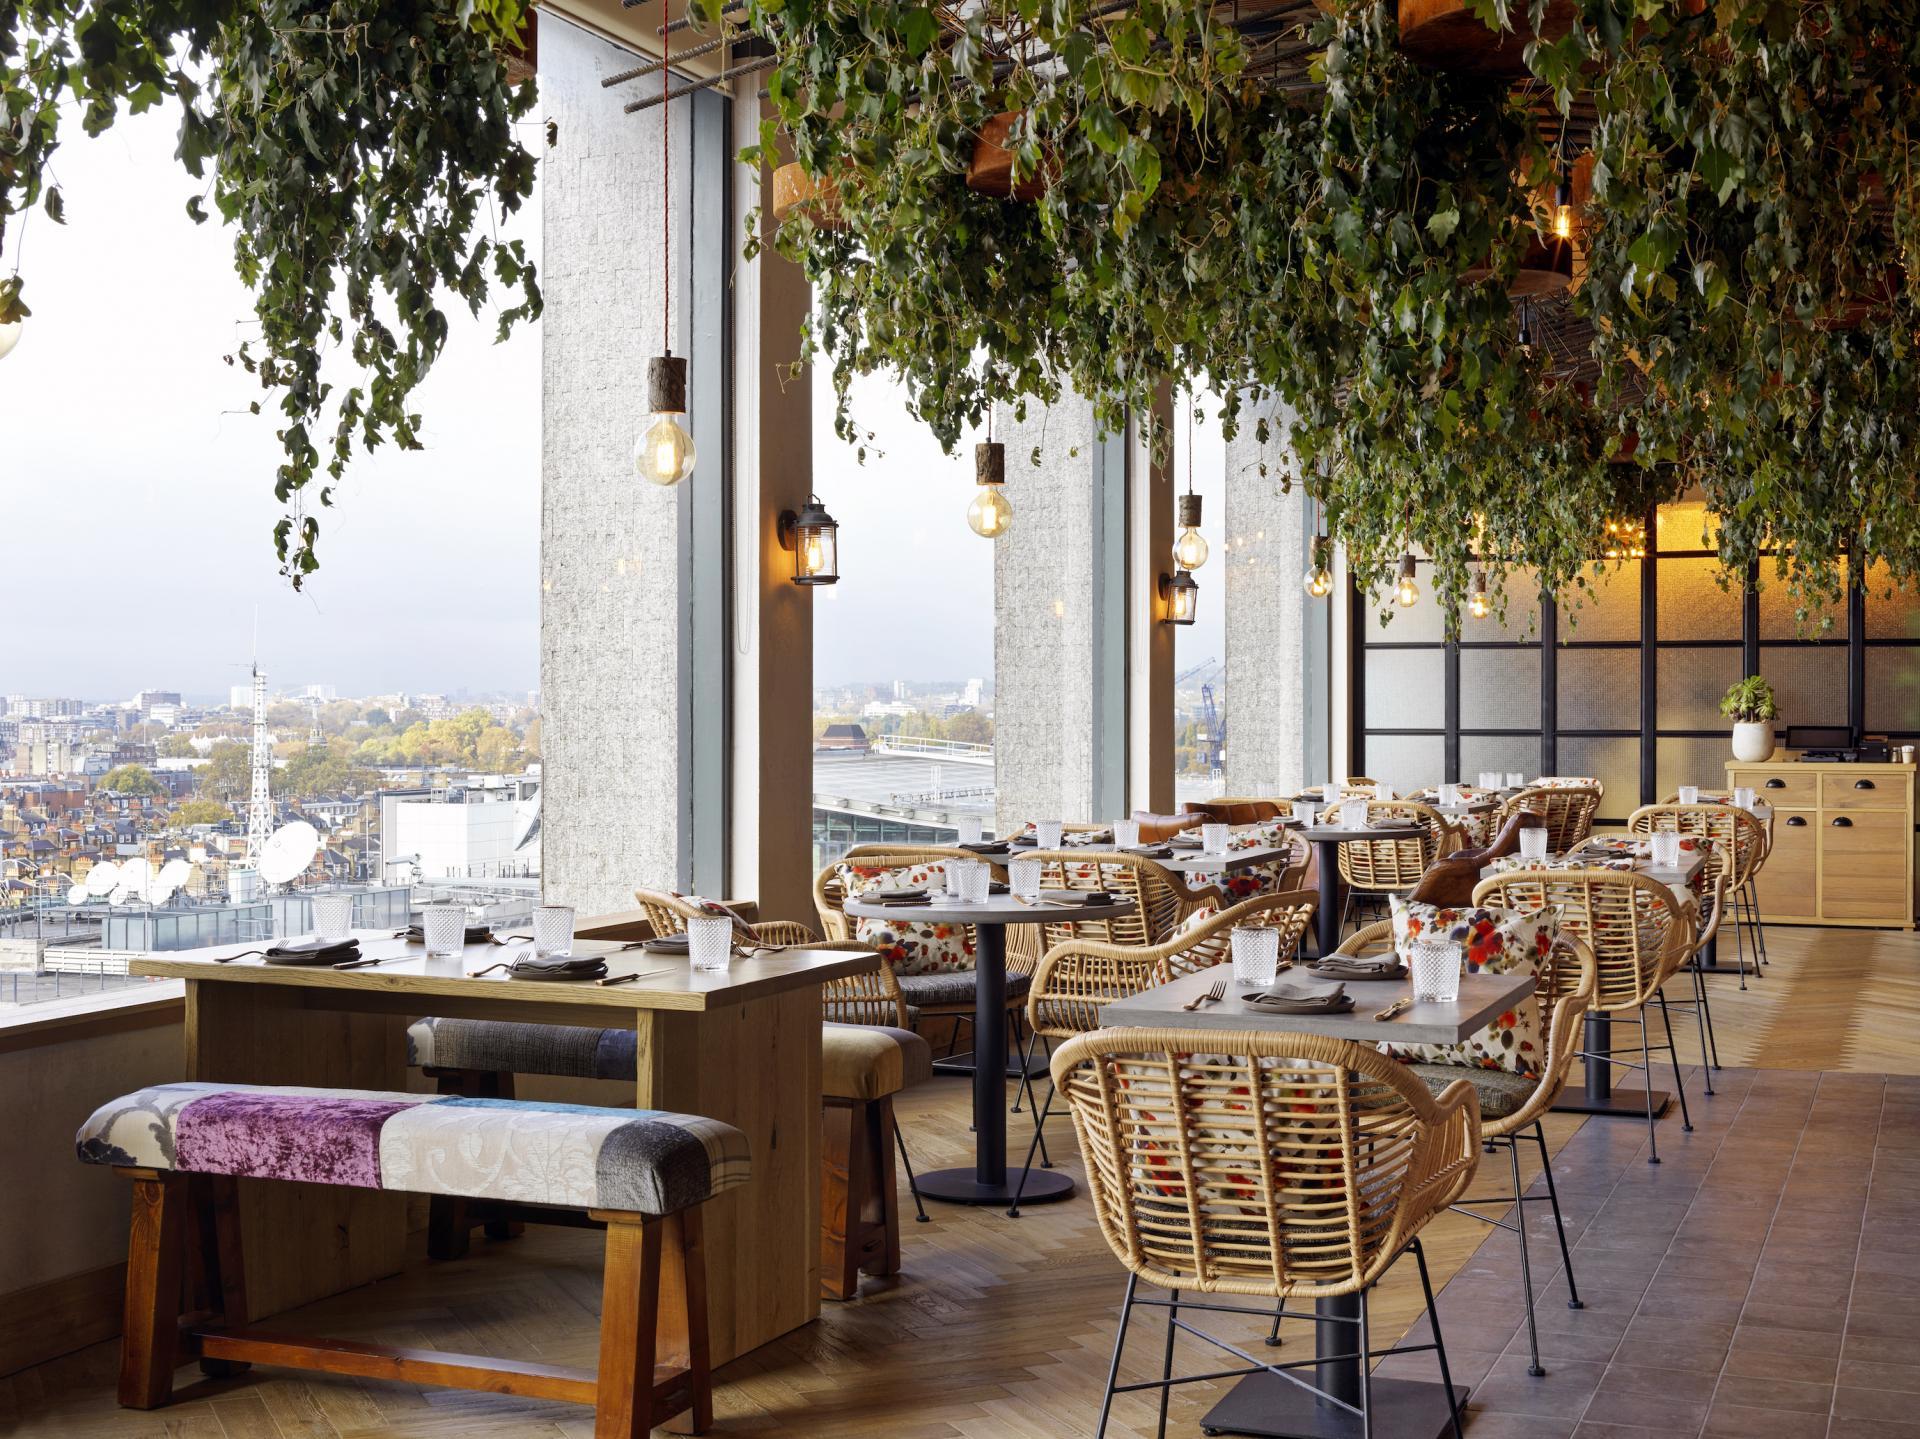 Restaurants and bars Regent Street: The Nest at Treehouse